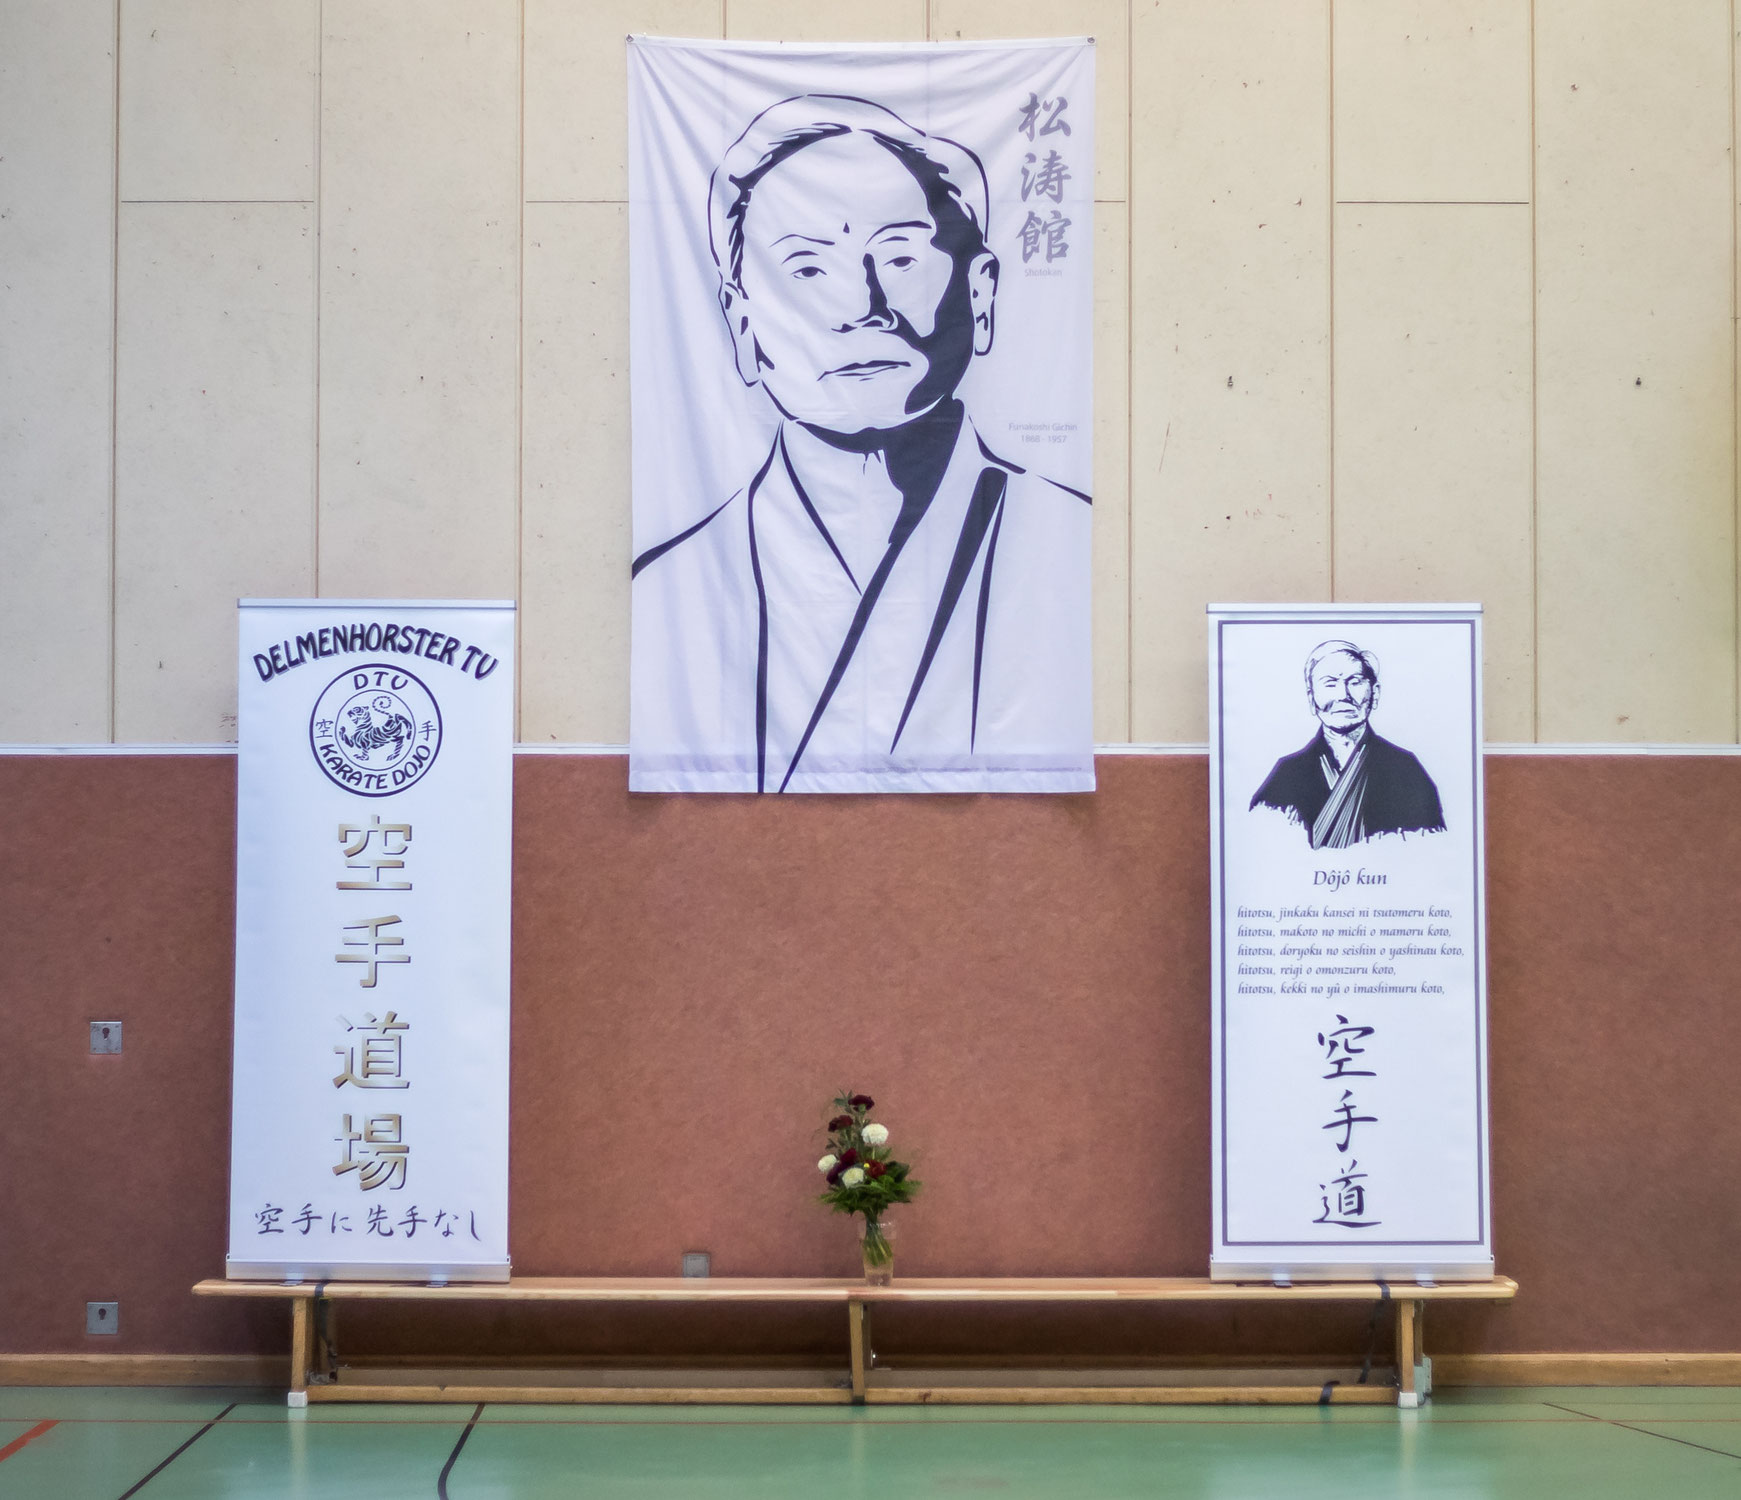 40jähriges Jubiläum der Karate-Abteilung im Delmenhorster Turnverein